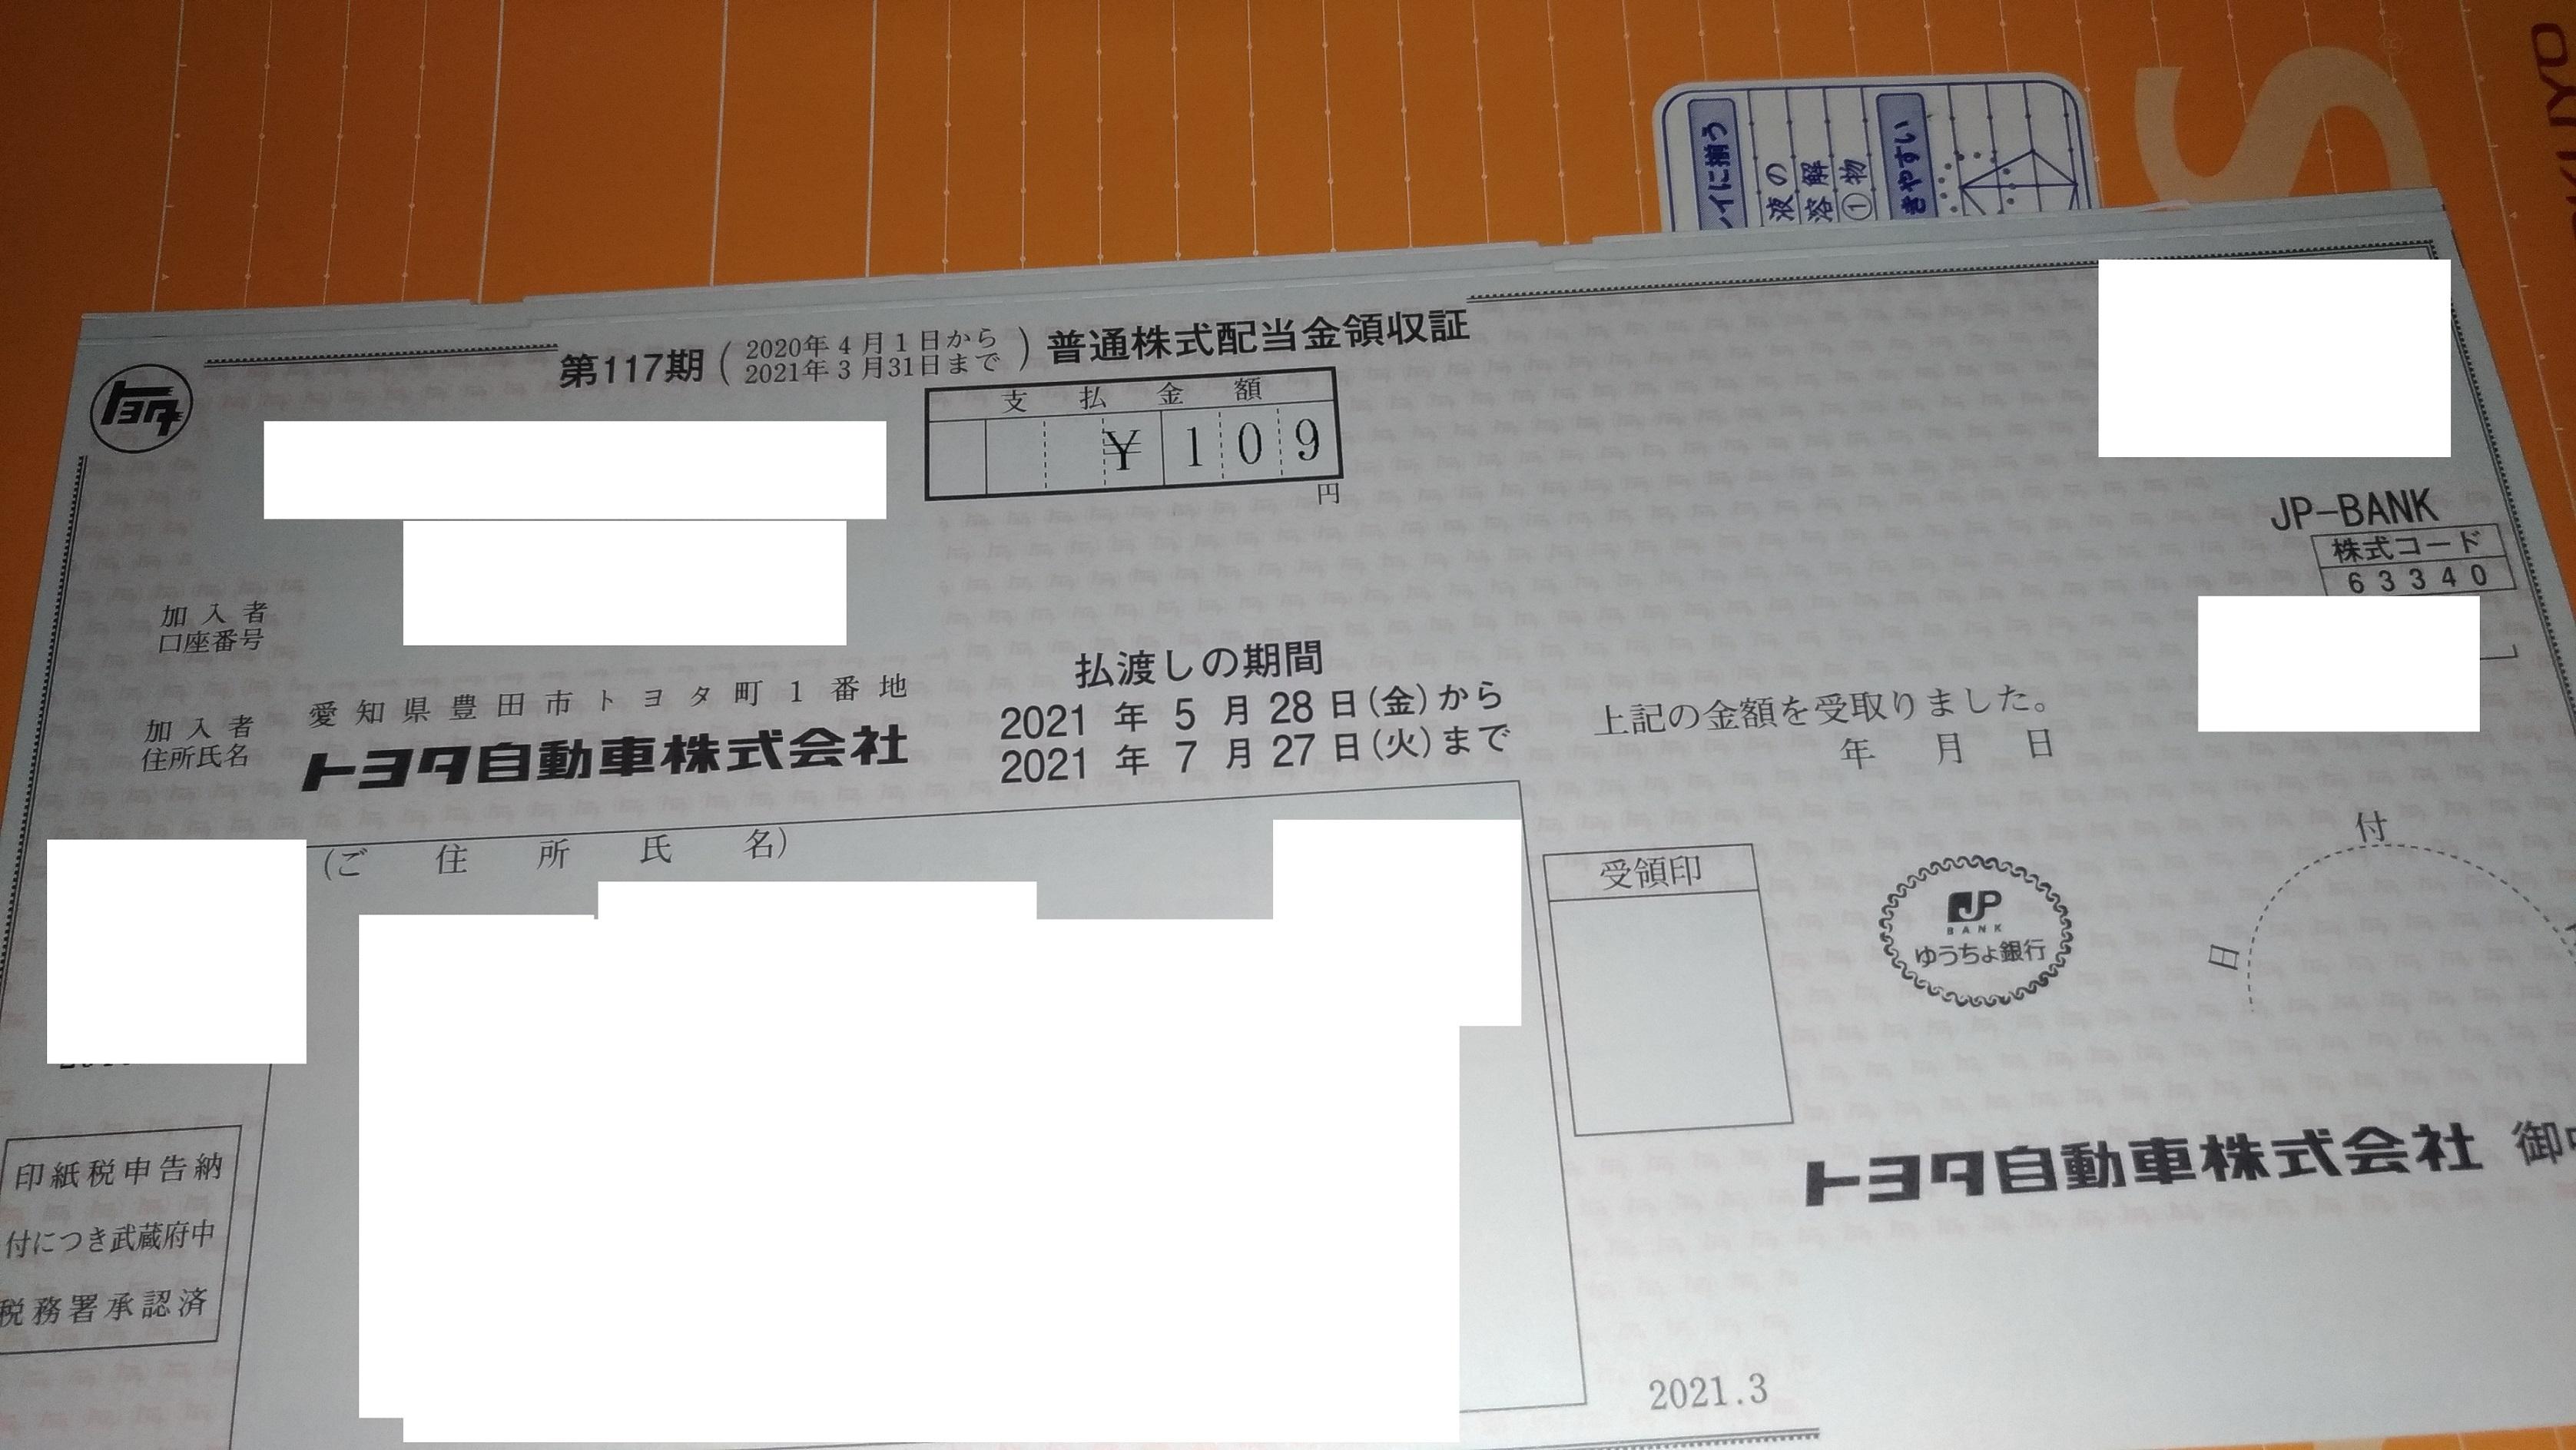 haito_2021_05_30_toyota_1.jpg